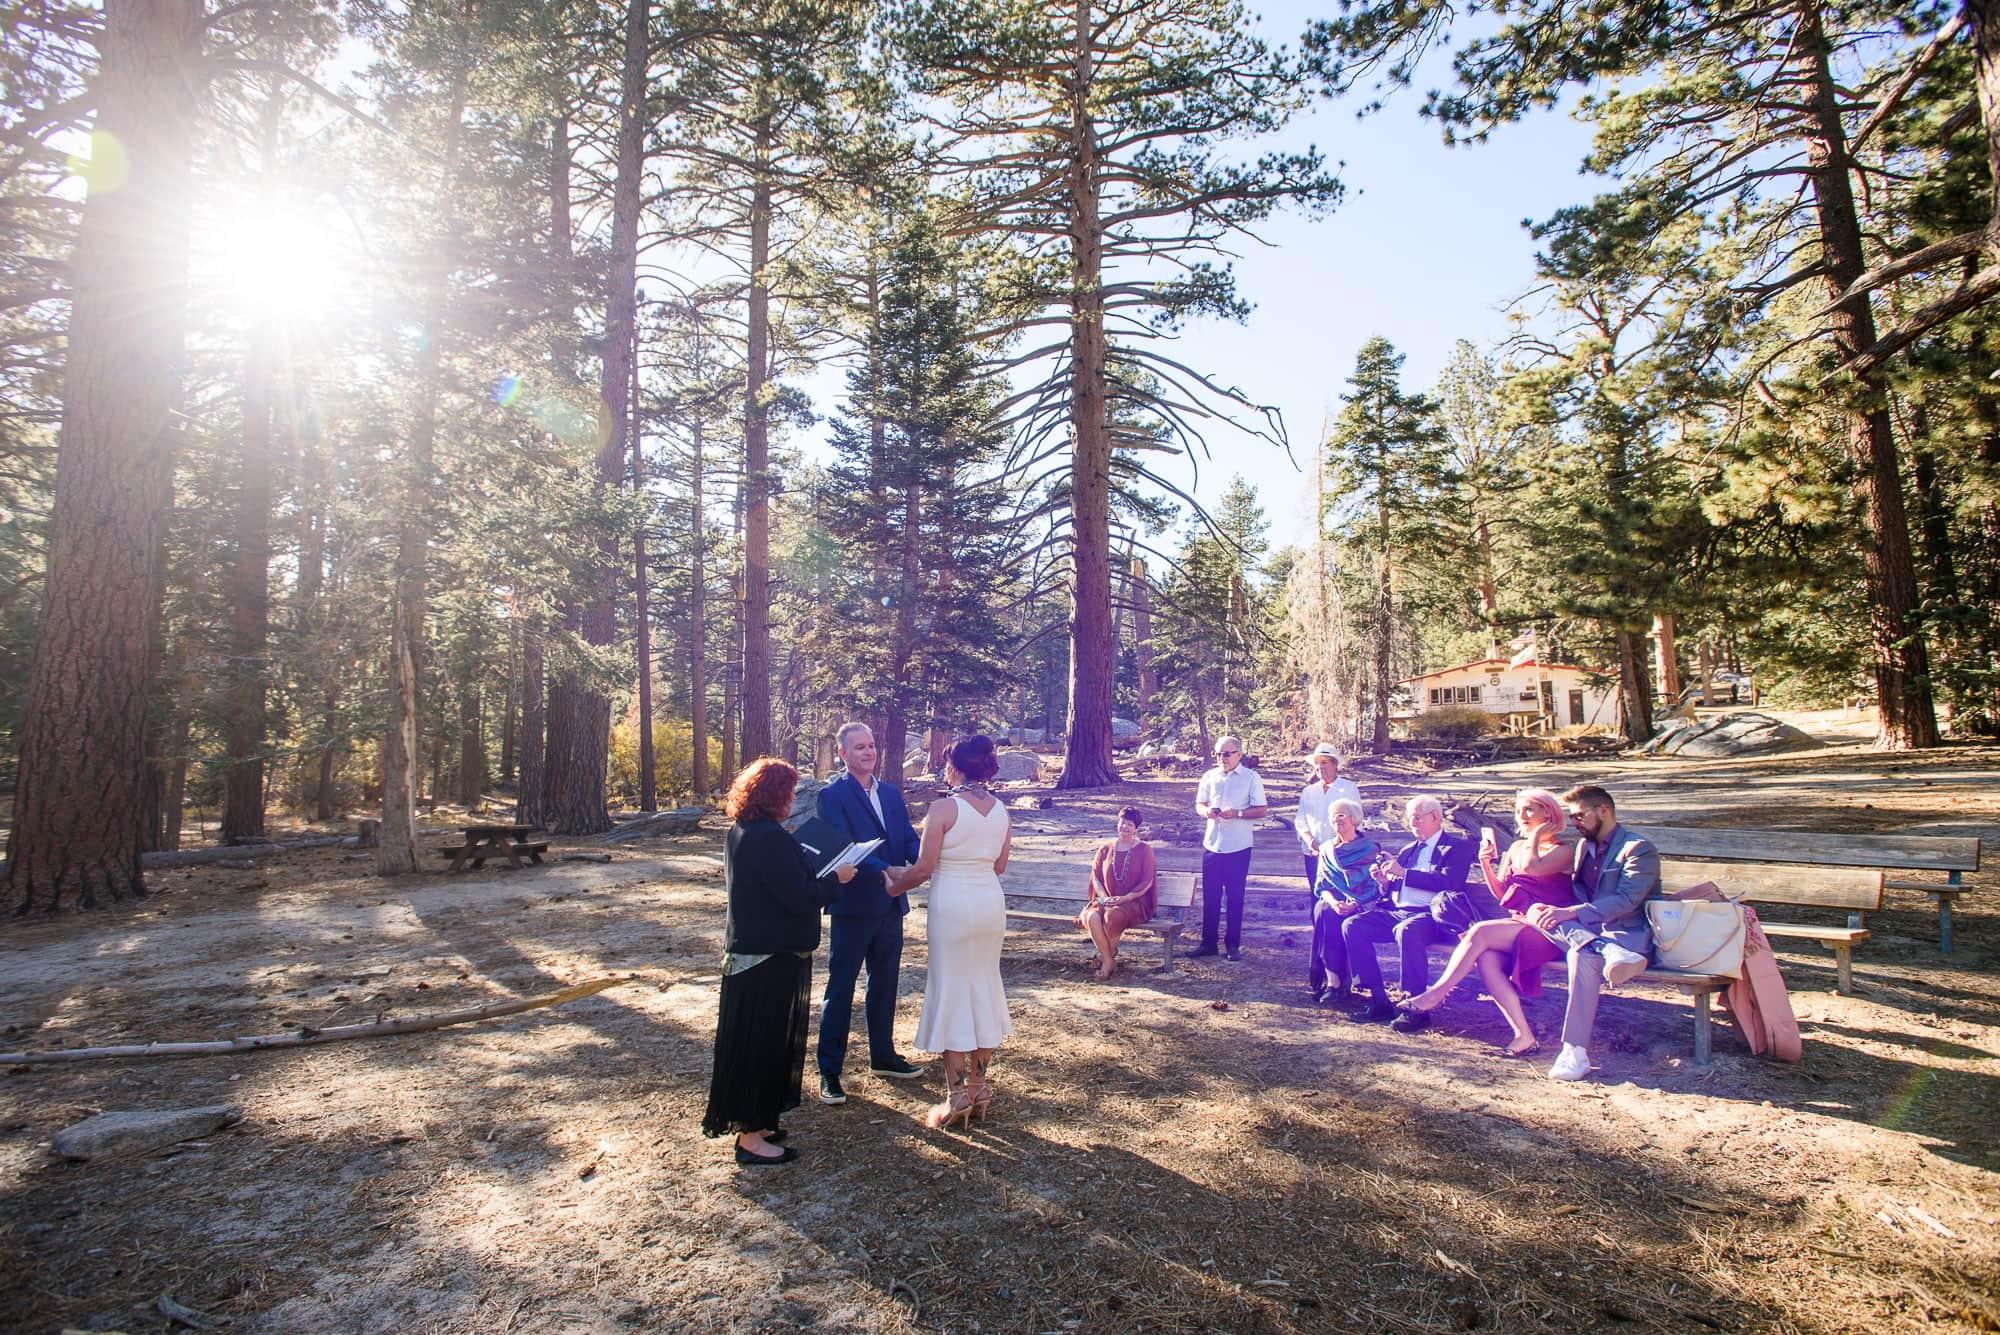 012_Alan_and_Heidi_Palm_Springs_Tram_Wedding